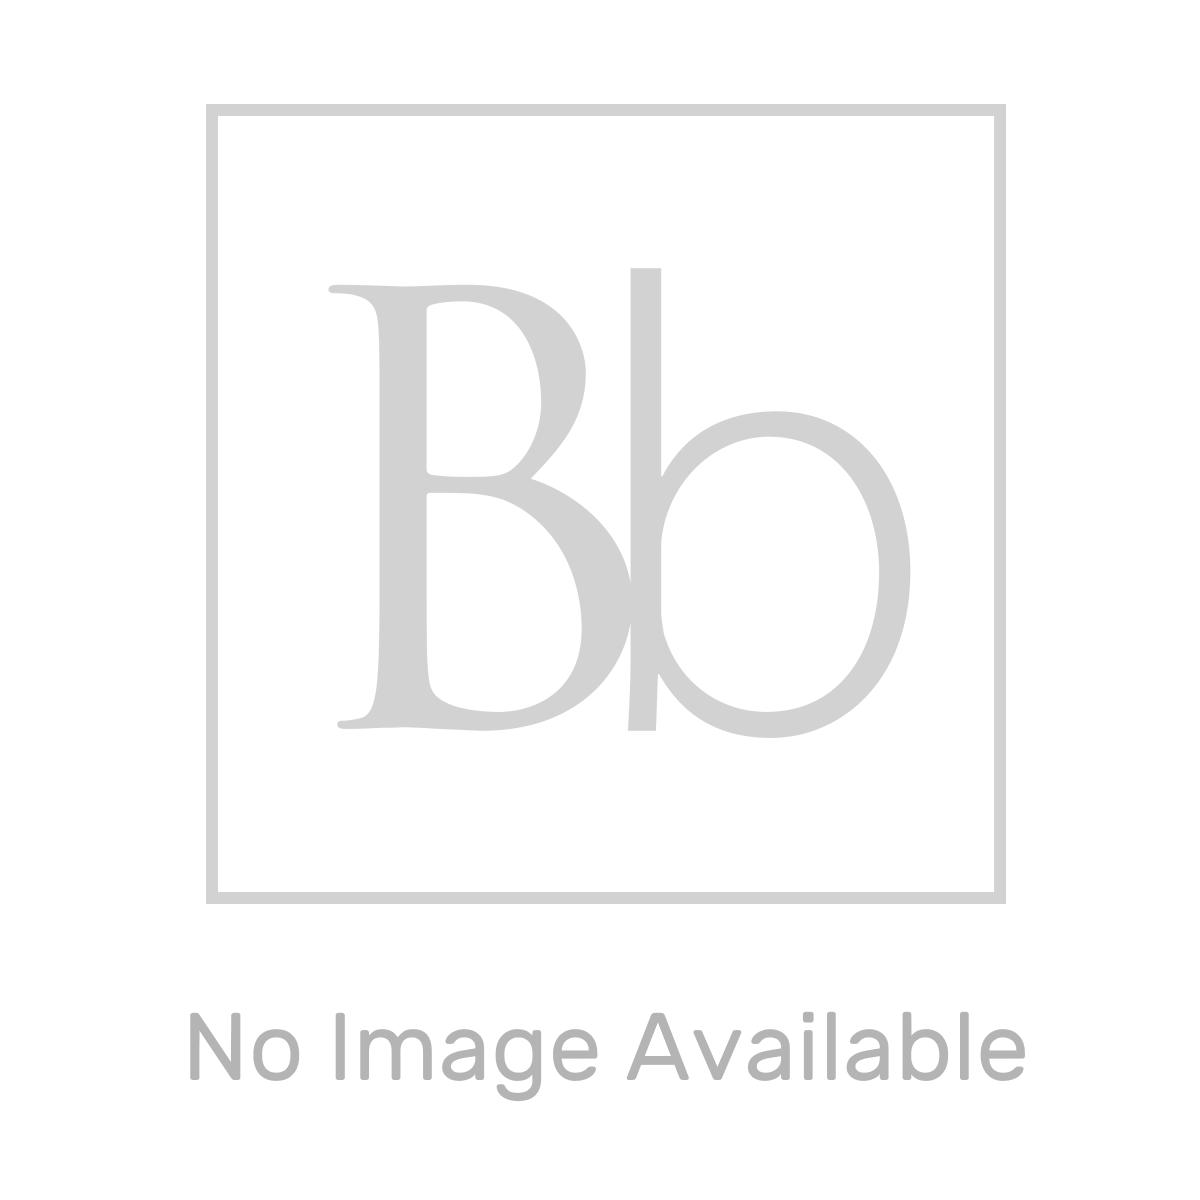 Nuie Athena Driftwood 2 Drawer Floor Standing Vanity Unit with 18mm Worktop 600mm